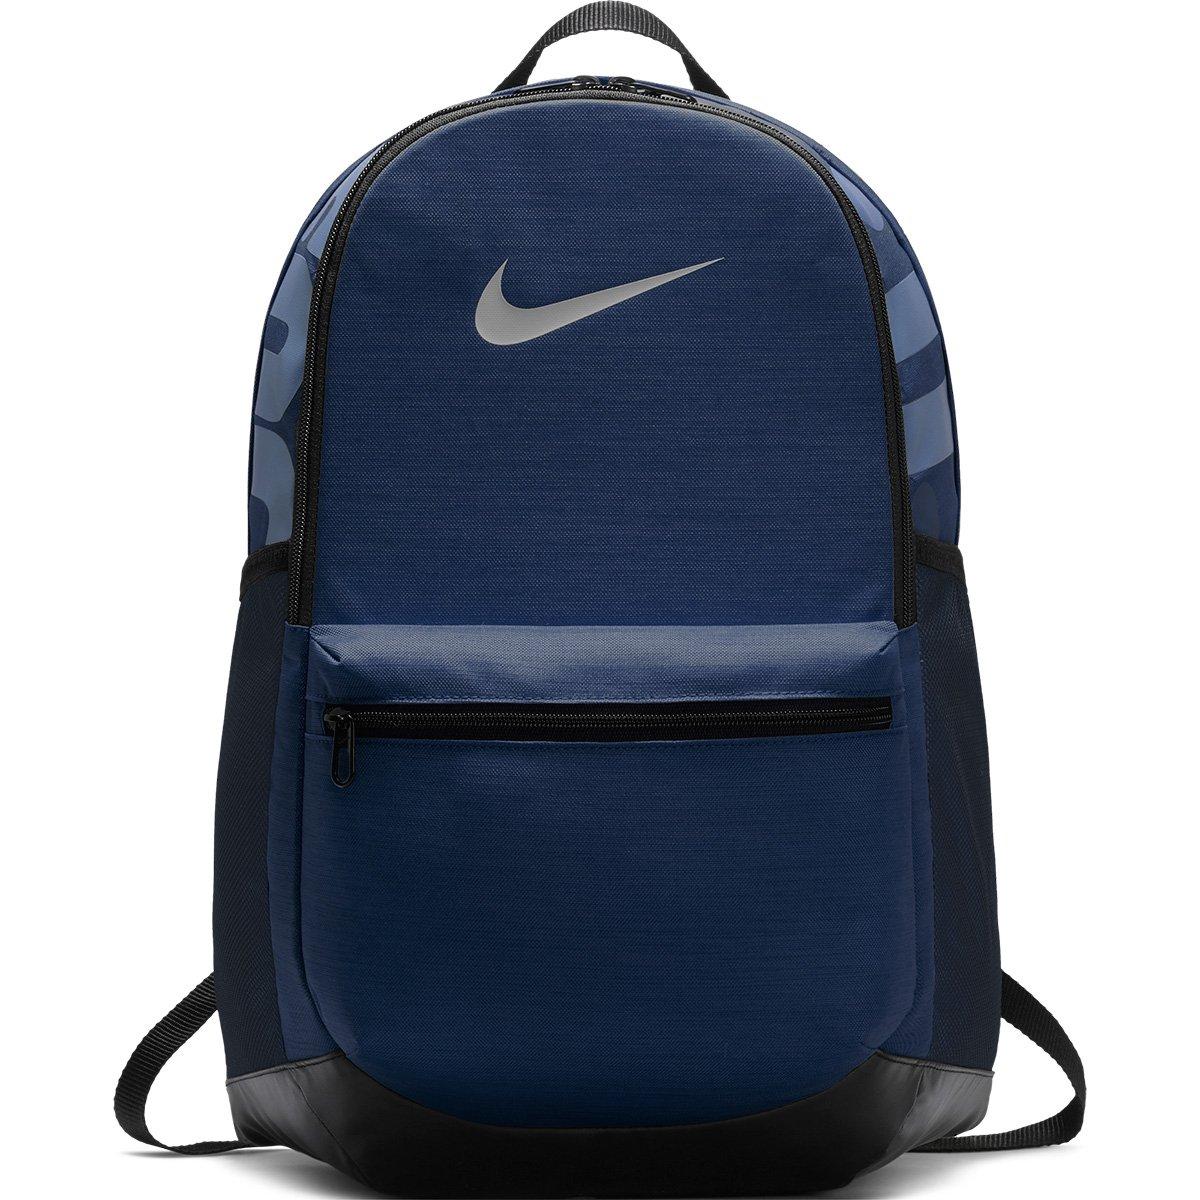 c830b4a98 Mochila Nike Brasilia Medium BA5329-480 - Azul Preto - Botas Online ...